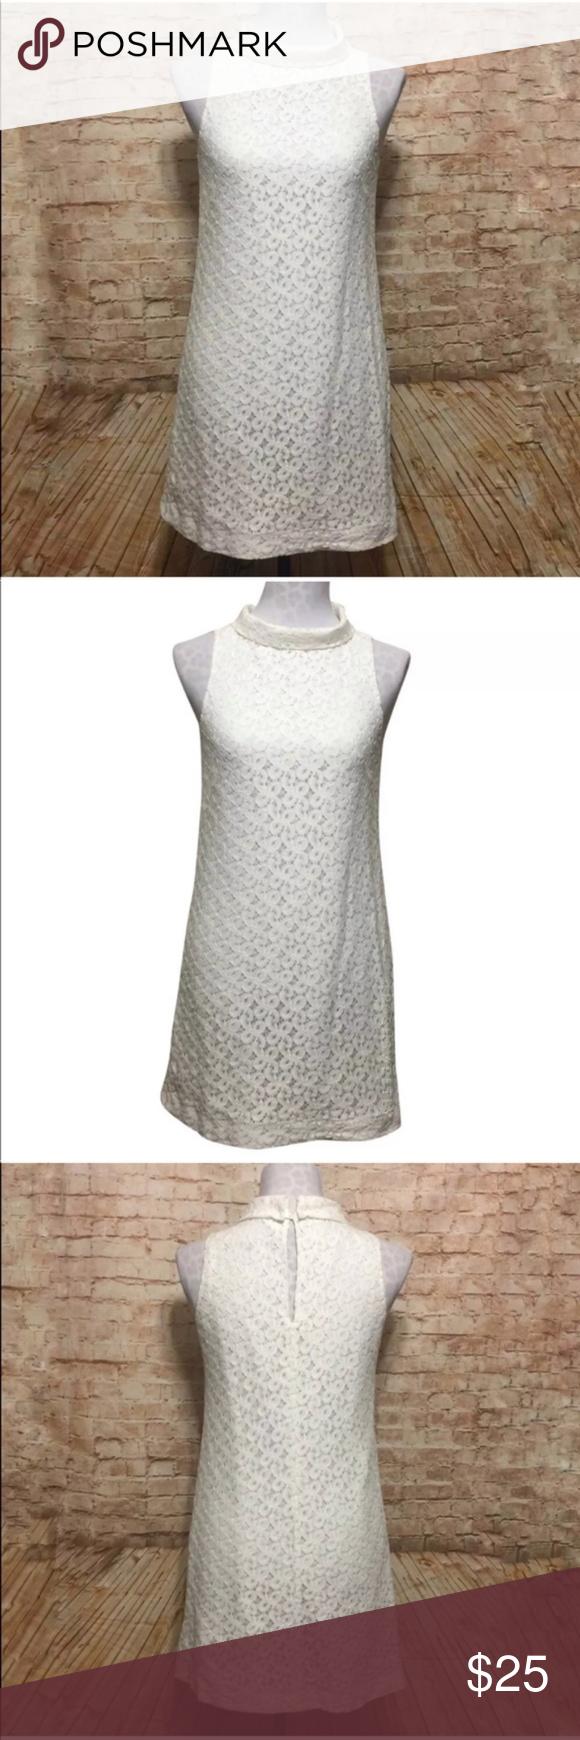 White lace dress zara  Zara White Lace Mod Style Retro Dress  My Posh Picks  Pinterest